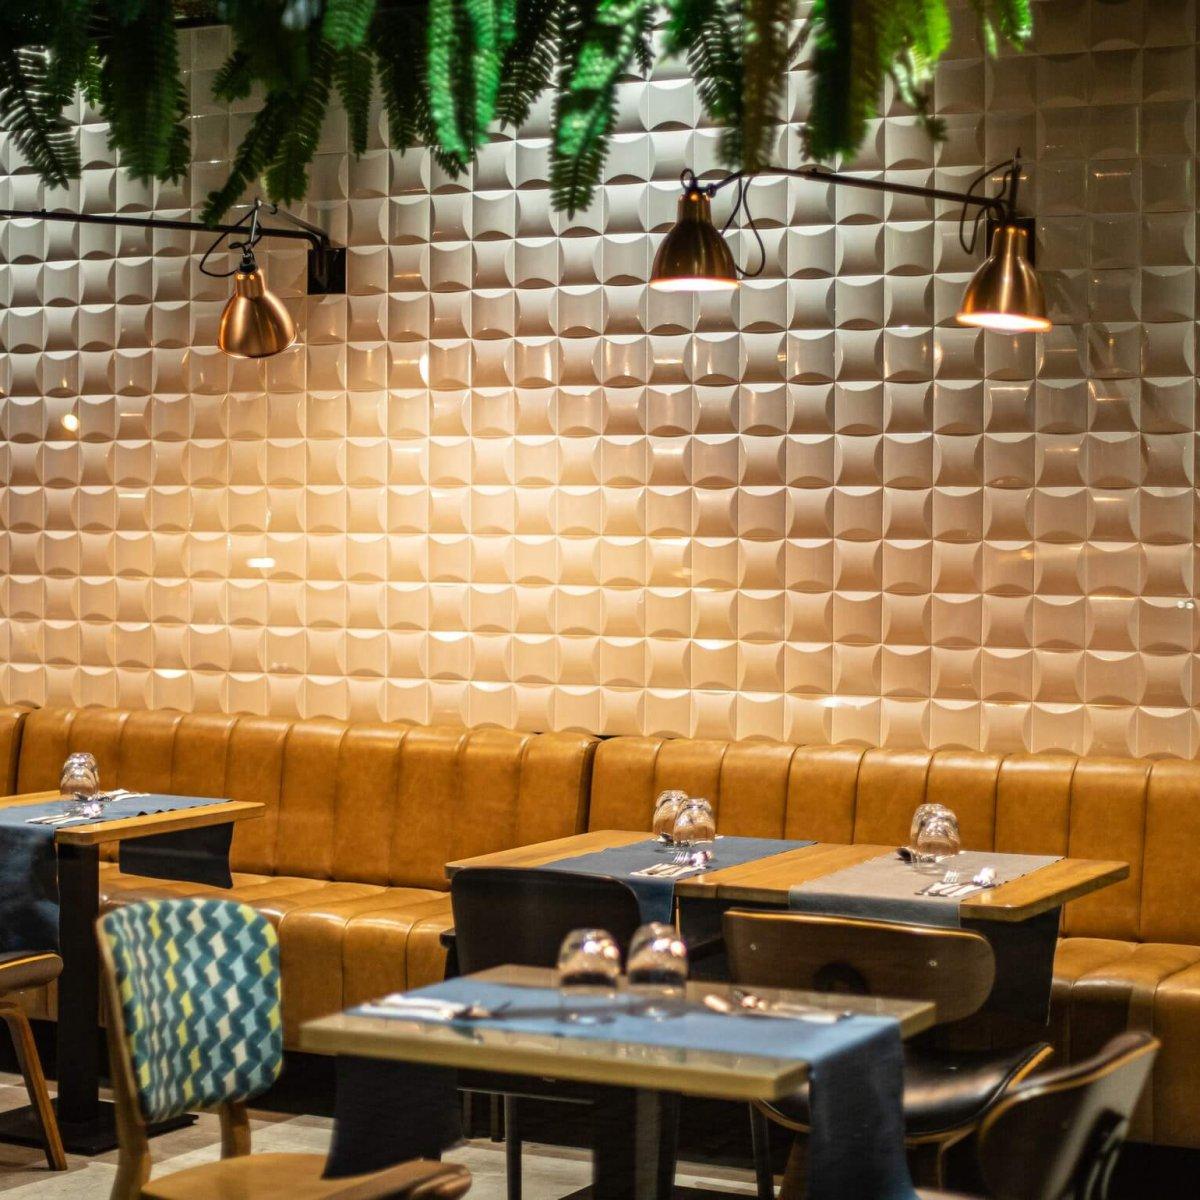 table 16 - National Restaurant Properties